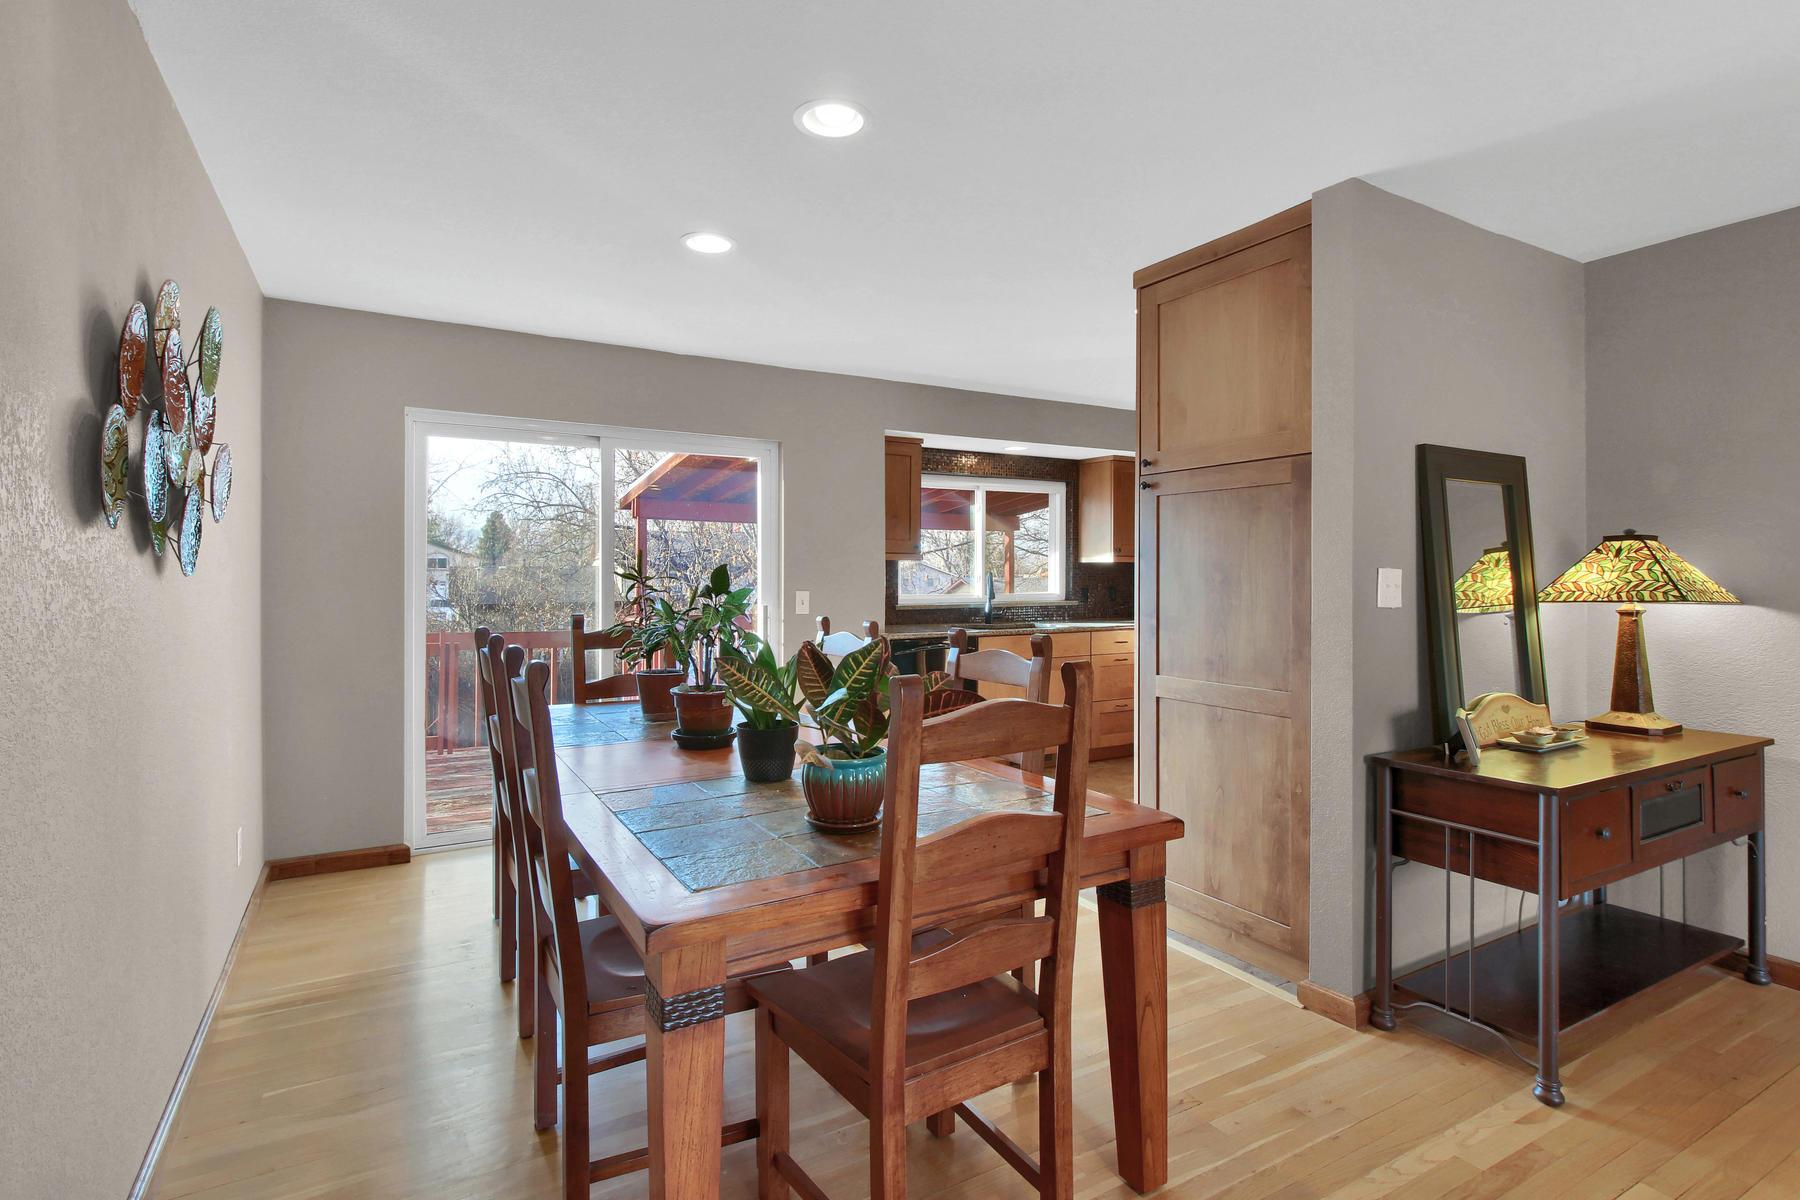 9375 Osceola St Westminster CO-011-18-Dining Room-MLS_Size.jpg